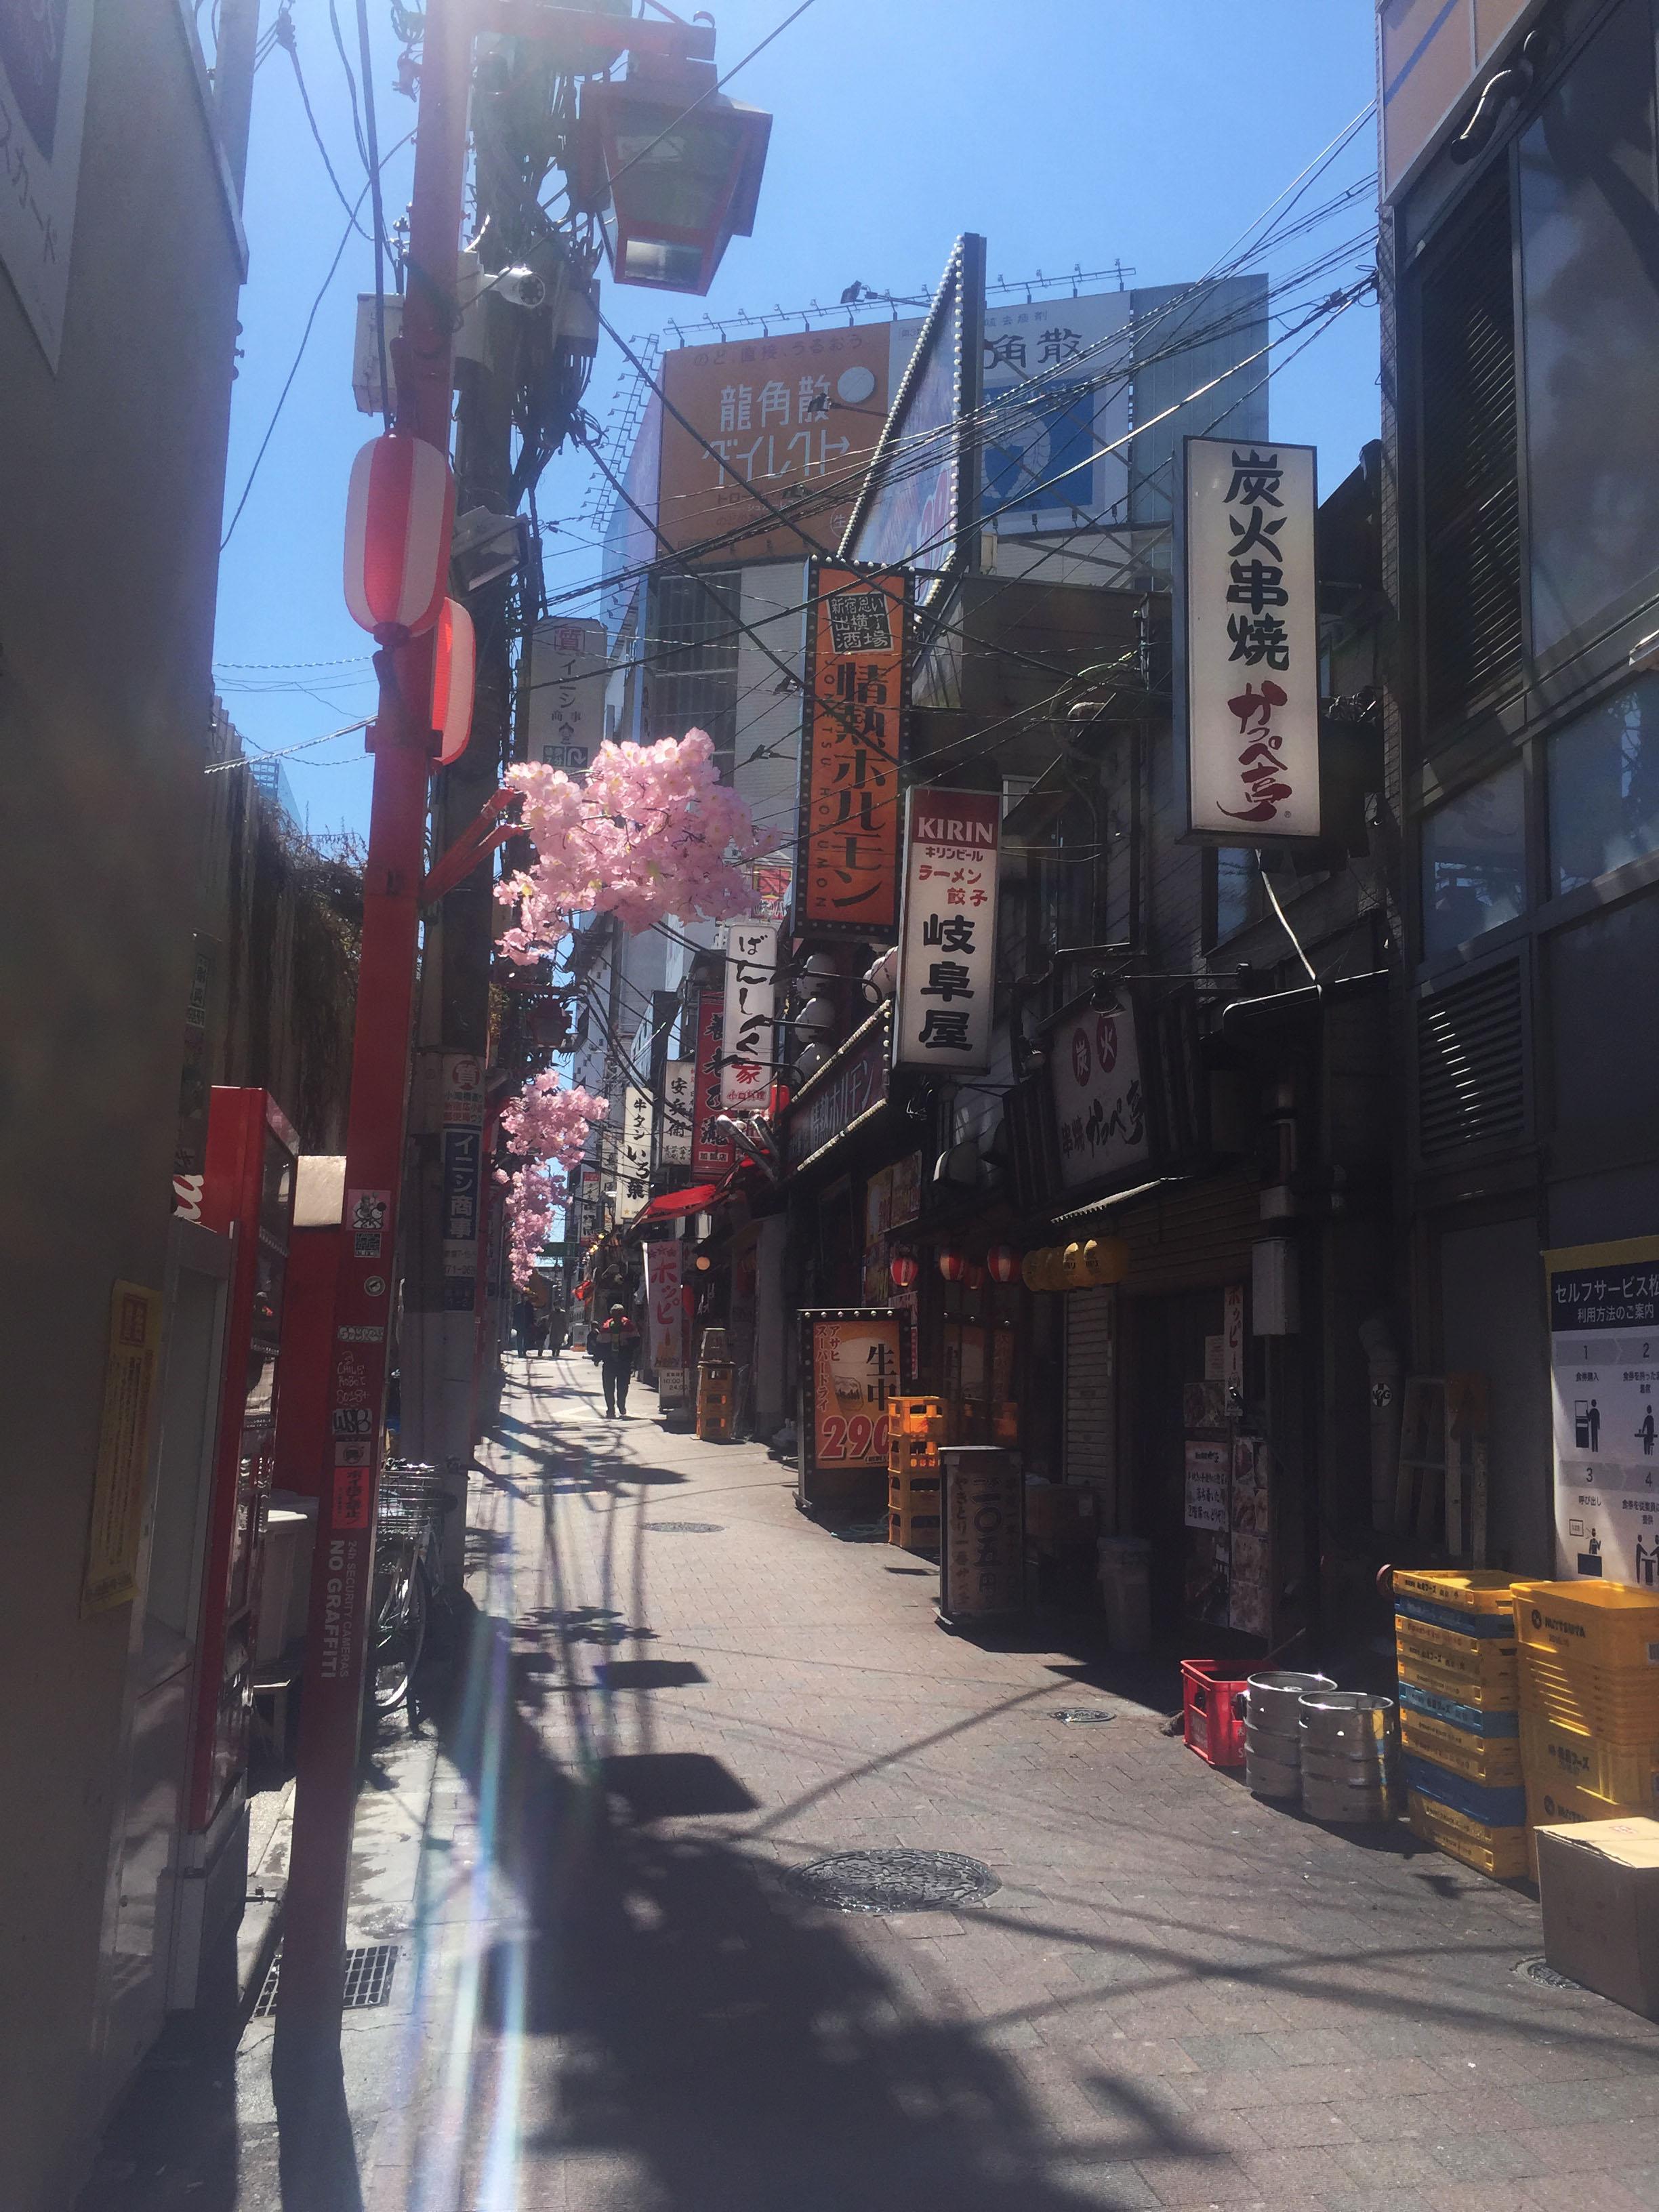 shinjuku alley daytime becky jewell.jpg